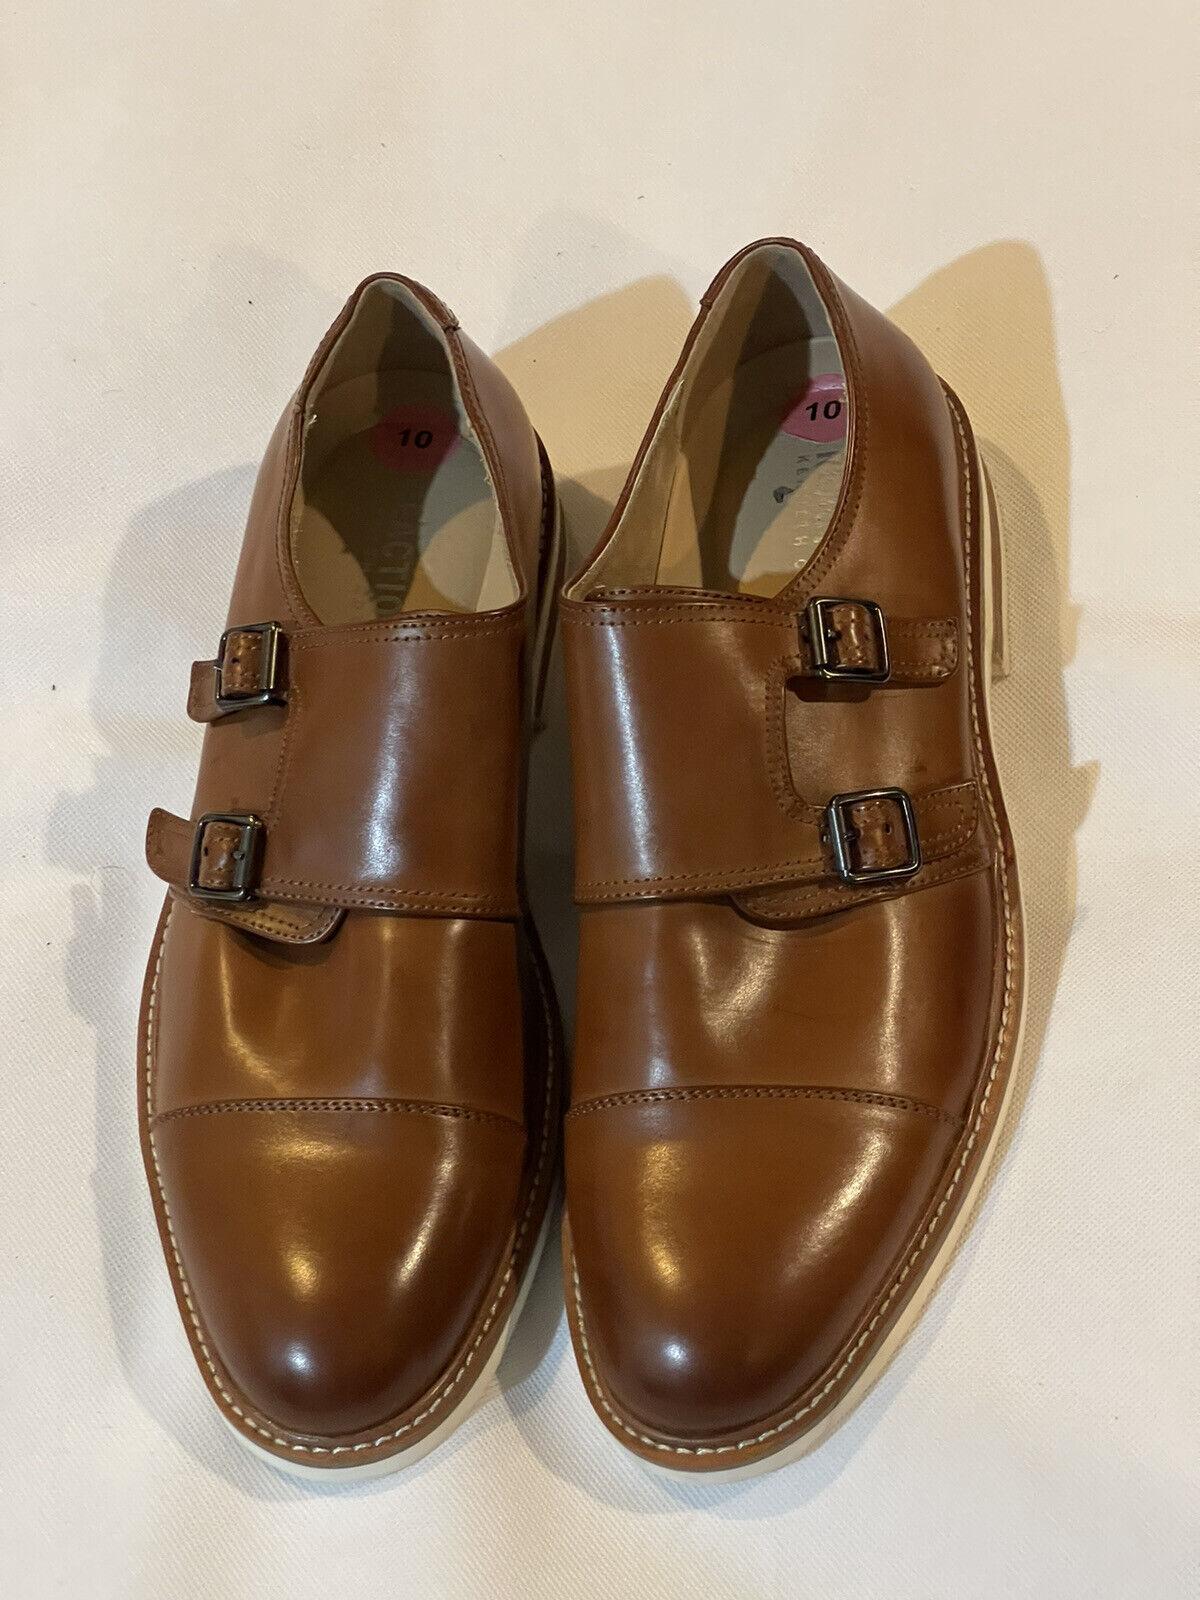 Kenneth Cole Reaction Mens Sz 10 Dress Shoes JOELS DBL Monk Brown NEW